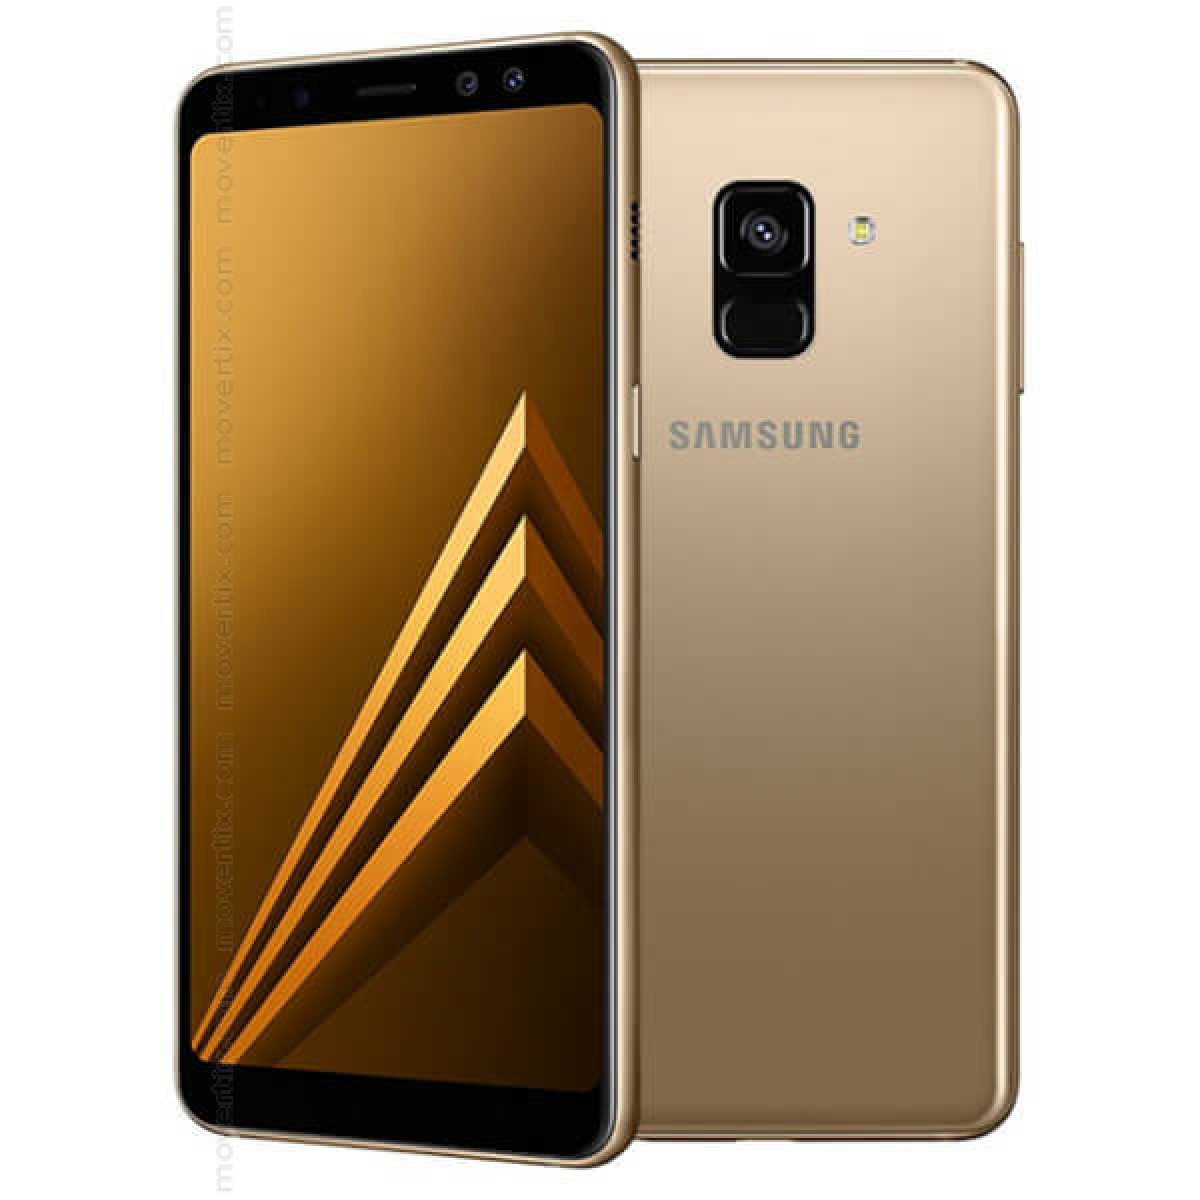 Samsung Galaxy A8 (2018) Dual SIM Gold 32GB - SM-A530 (8801643068196) | Movertix Mobile Phones Shop